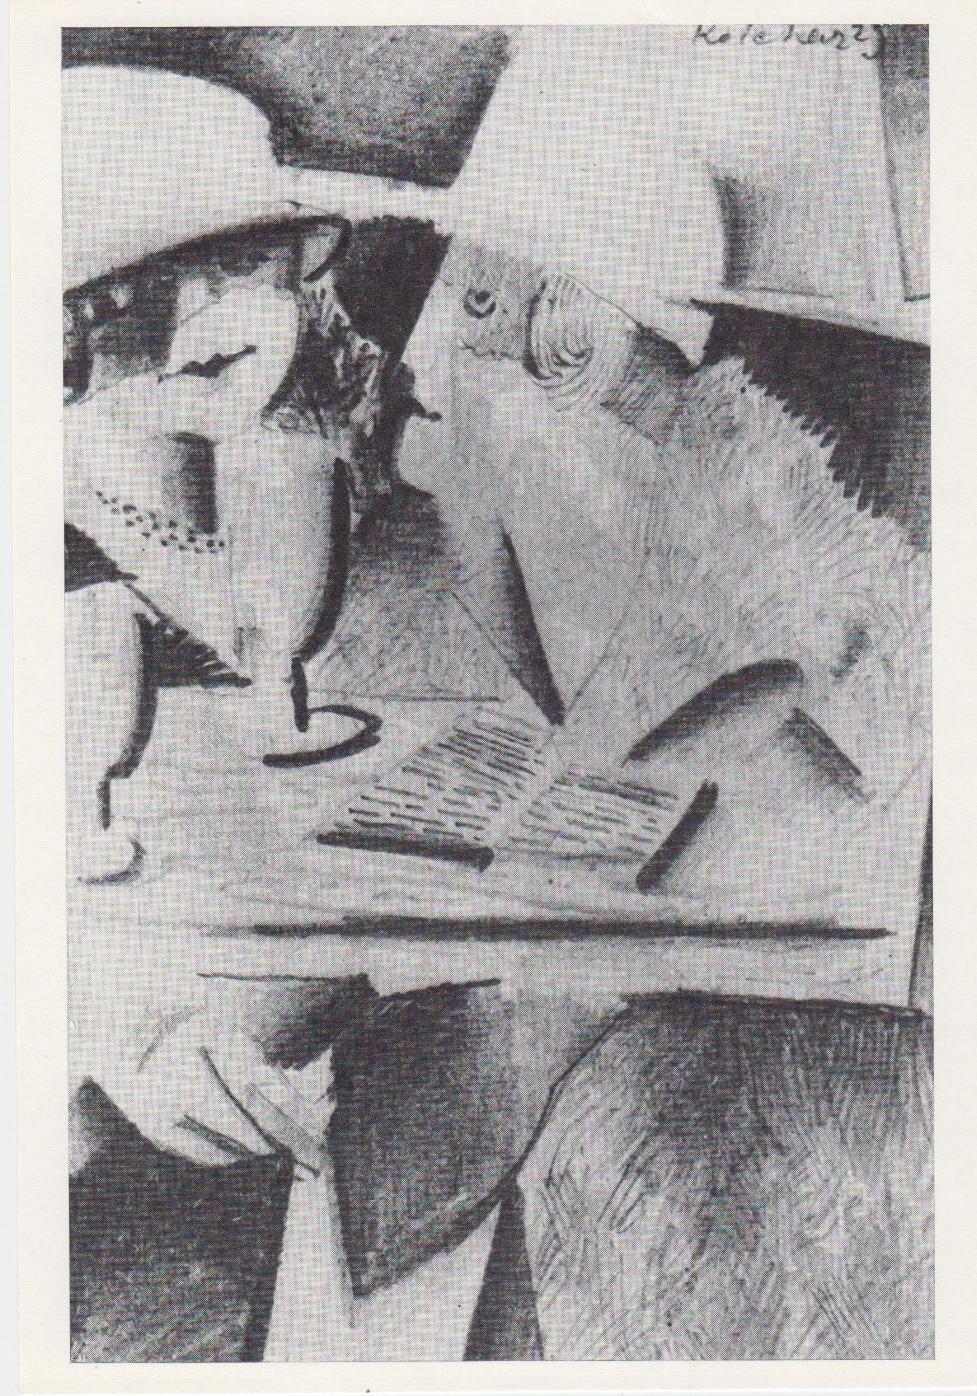 Е.С. Кочар. Женщины в кафе. 1923